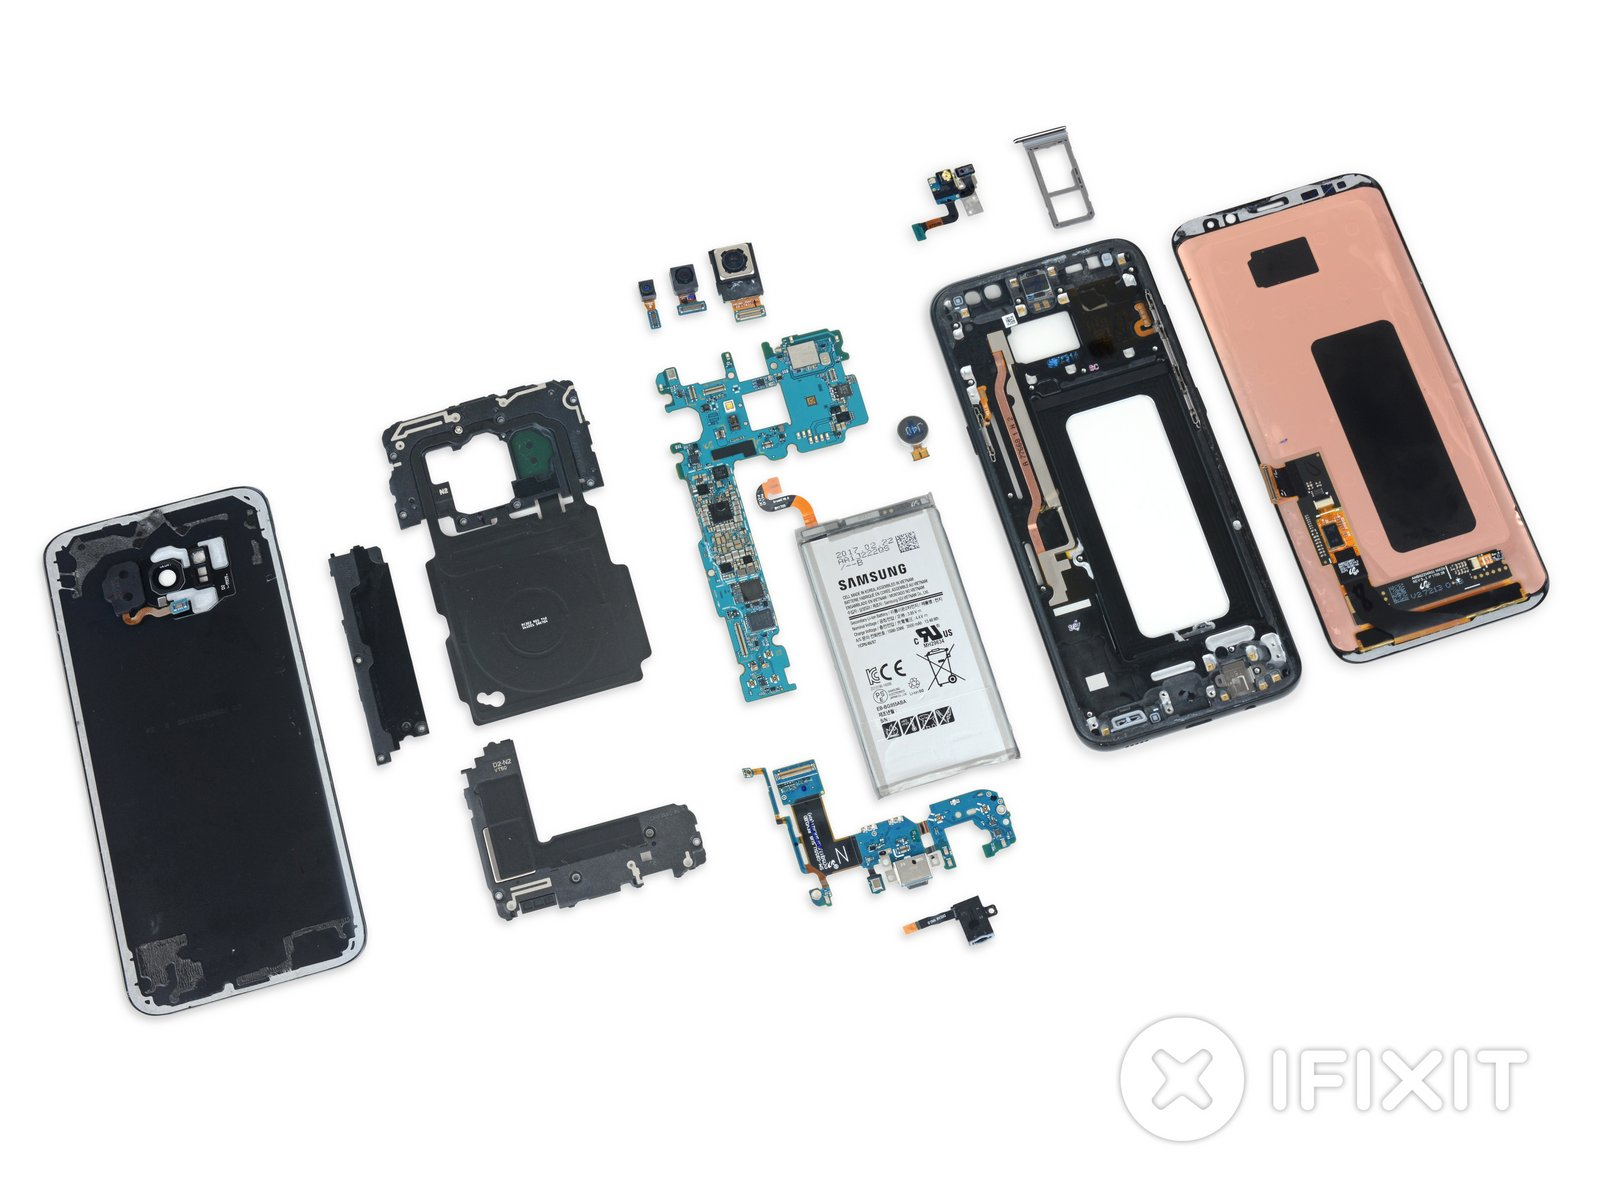 Vue éclatée du Samsung Galaxy S8+